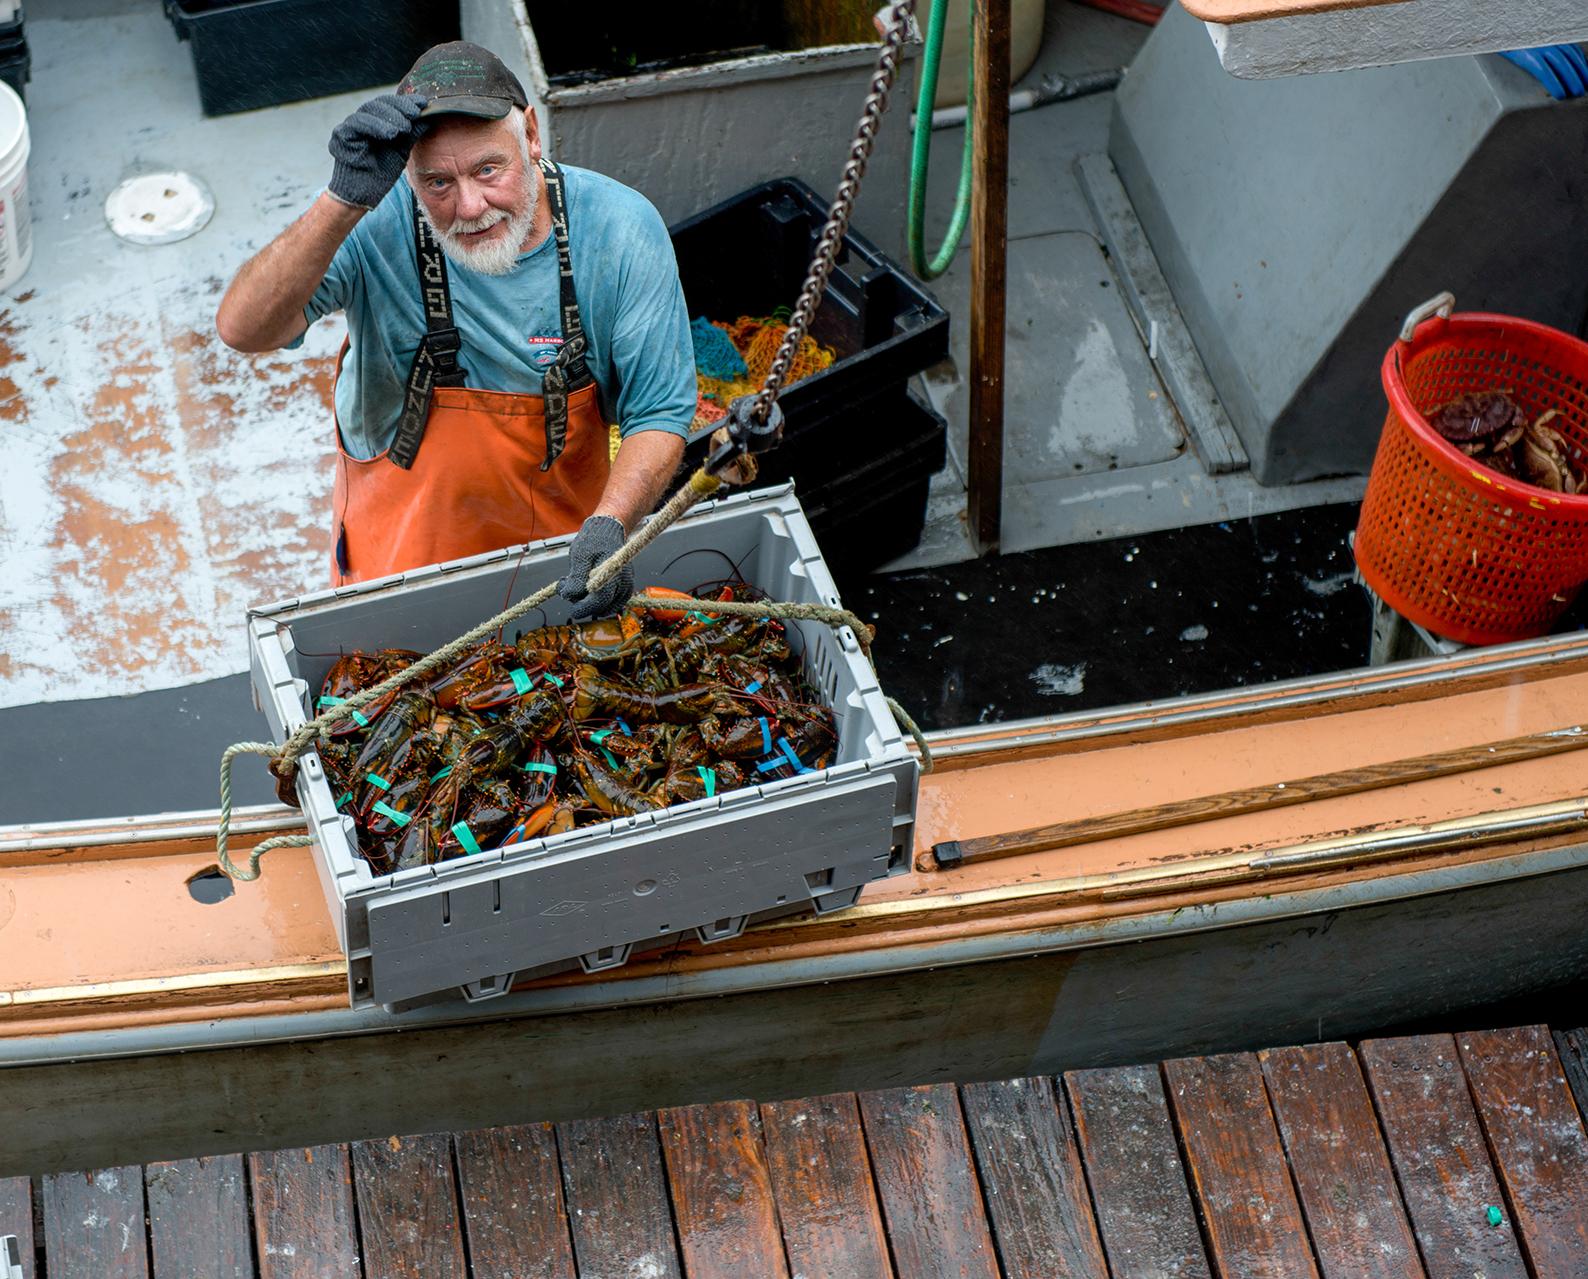 Buddy Olsen, a regular Harbor Fish supplier for 30 years